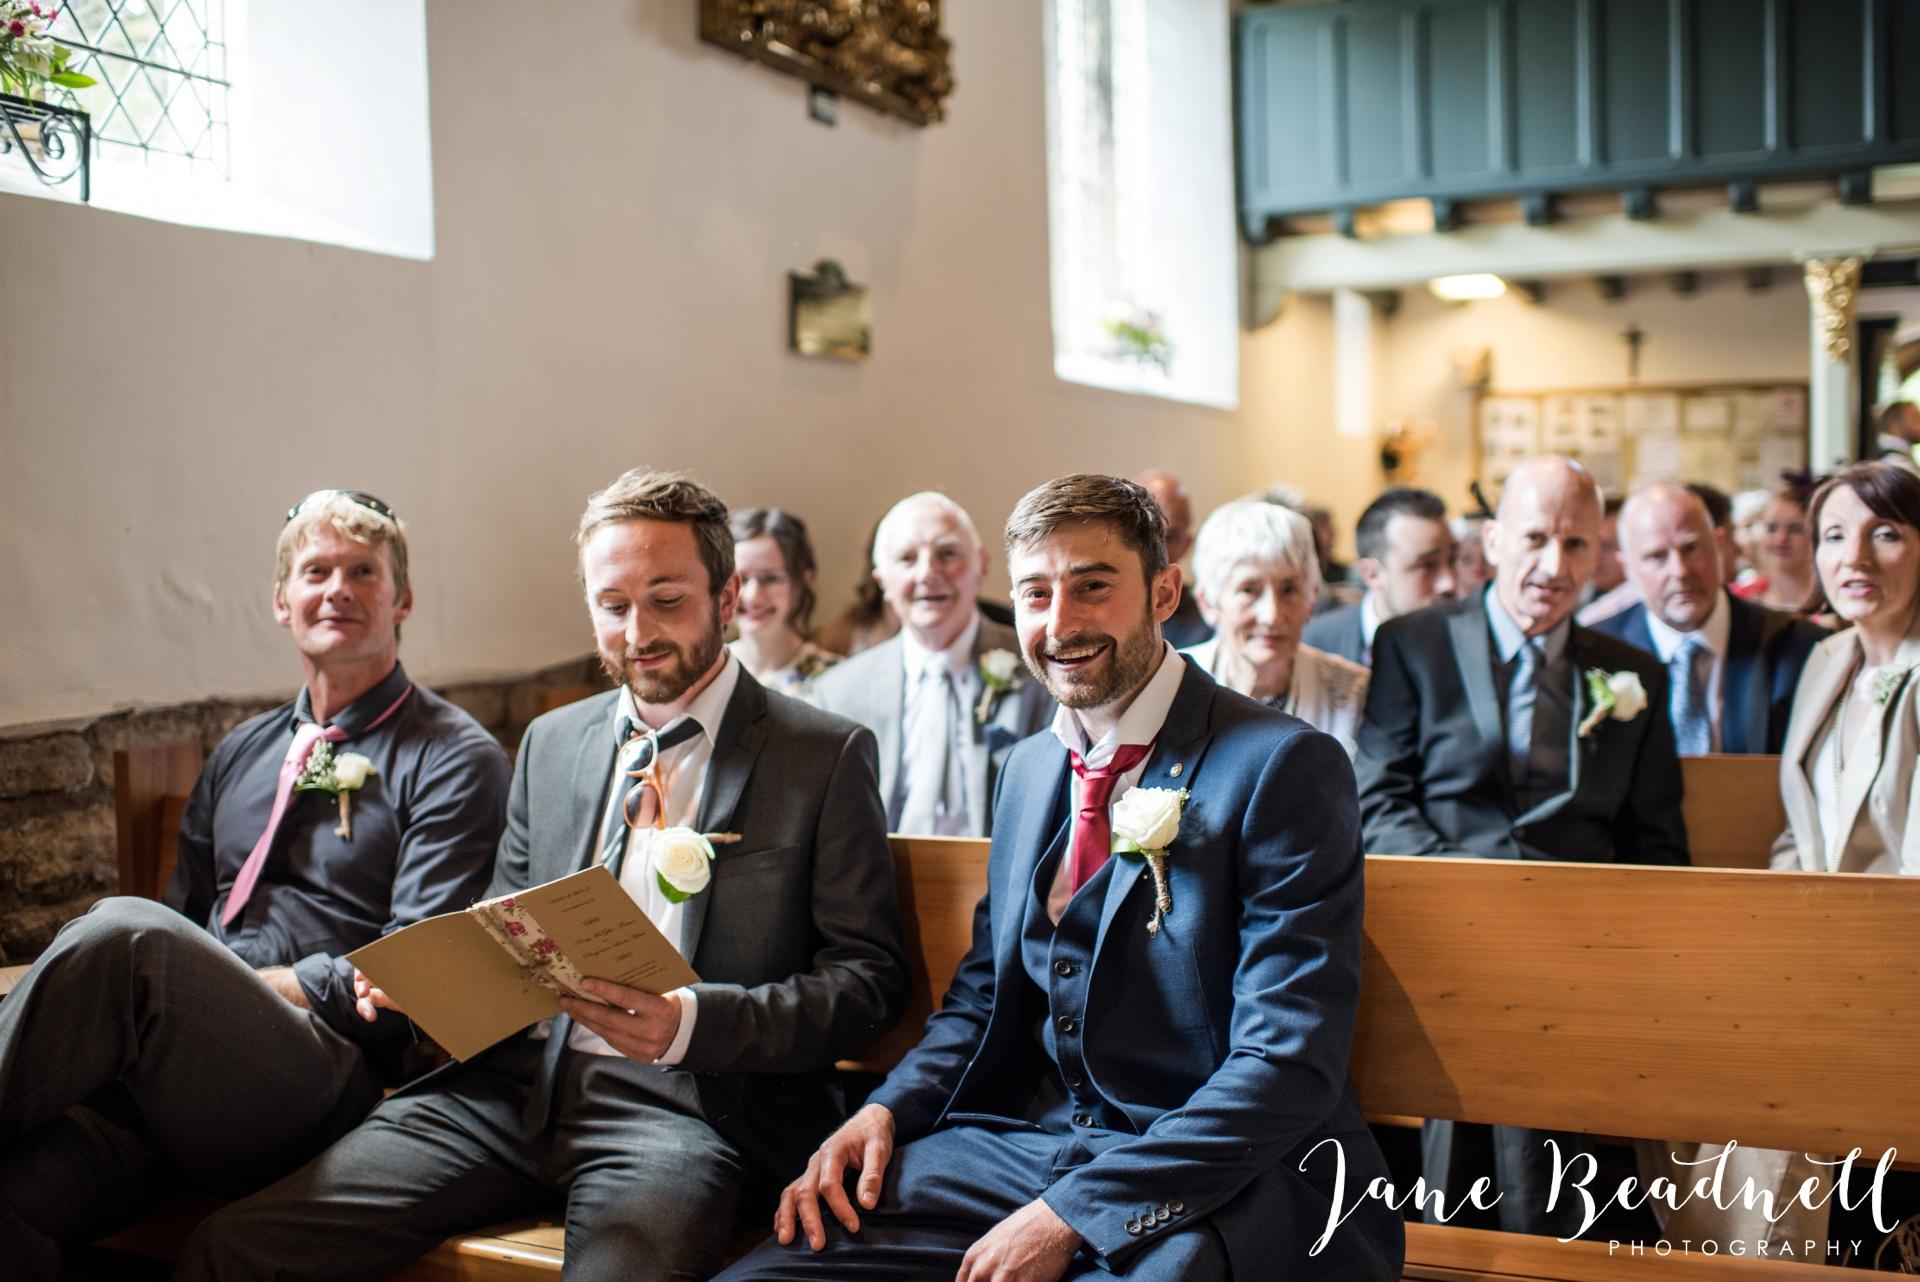 yorkshire-fine-art-wedding-photographer-jane-beadnell-photography-poppleton-york_0033